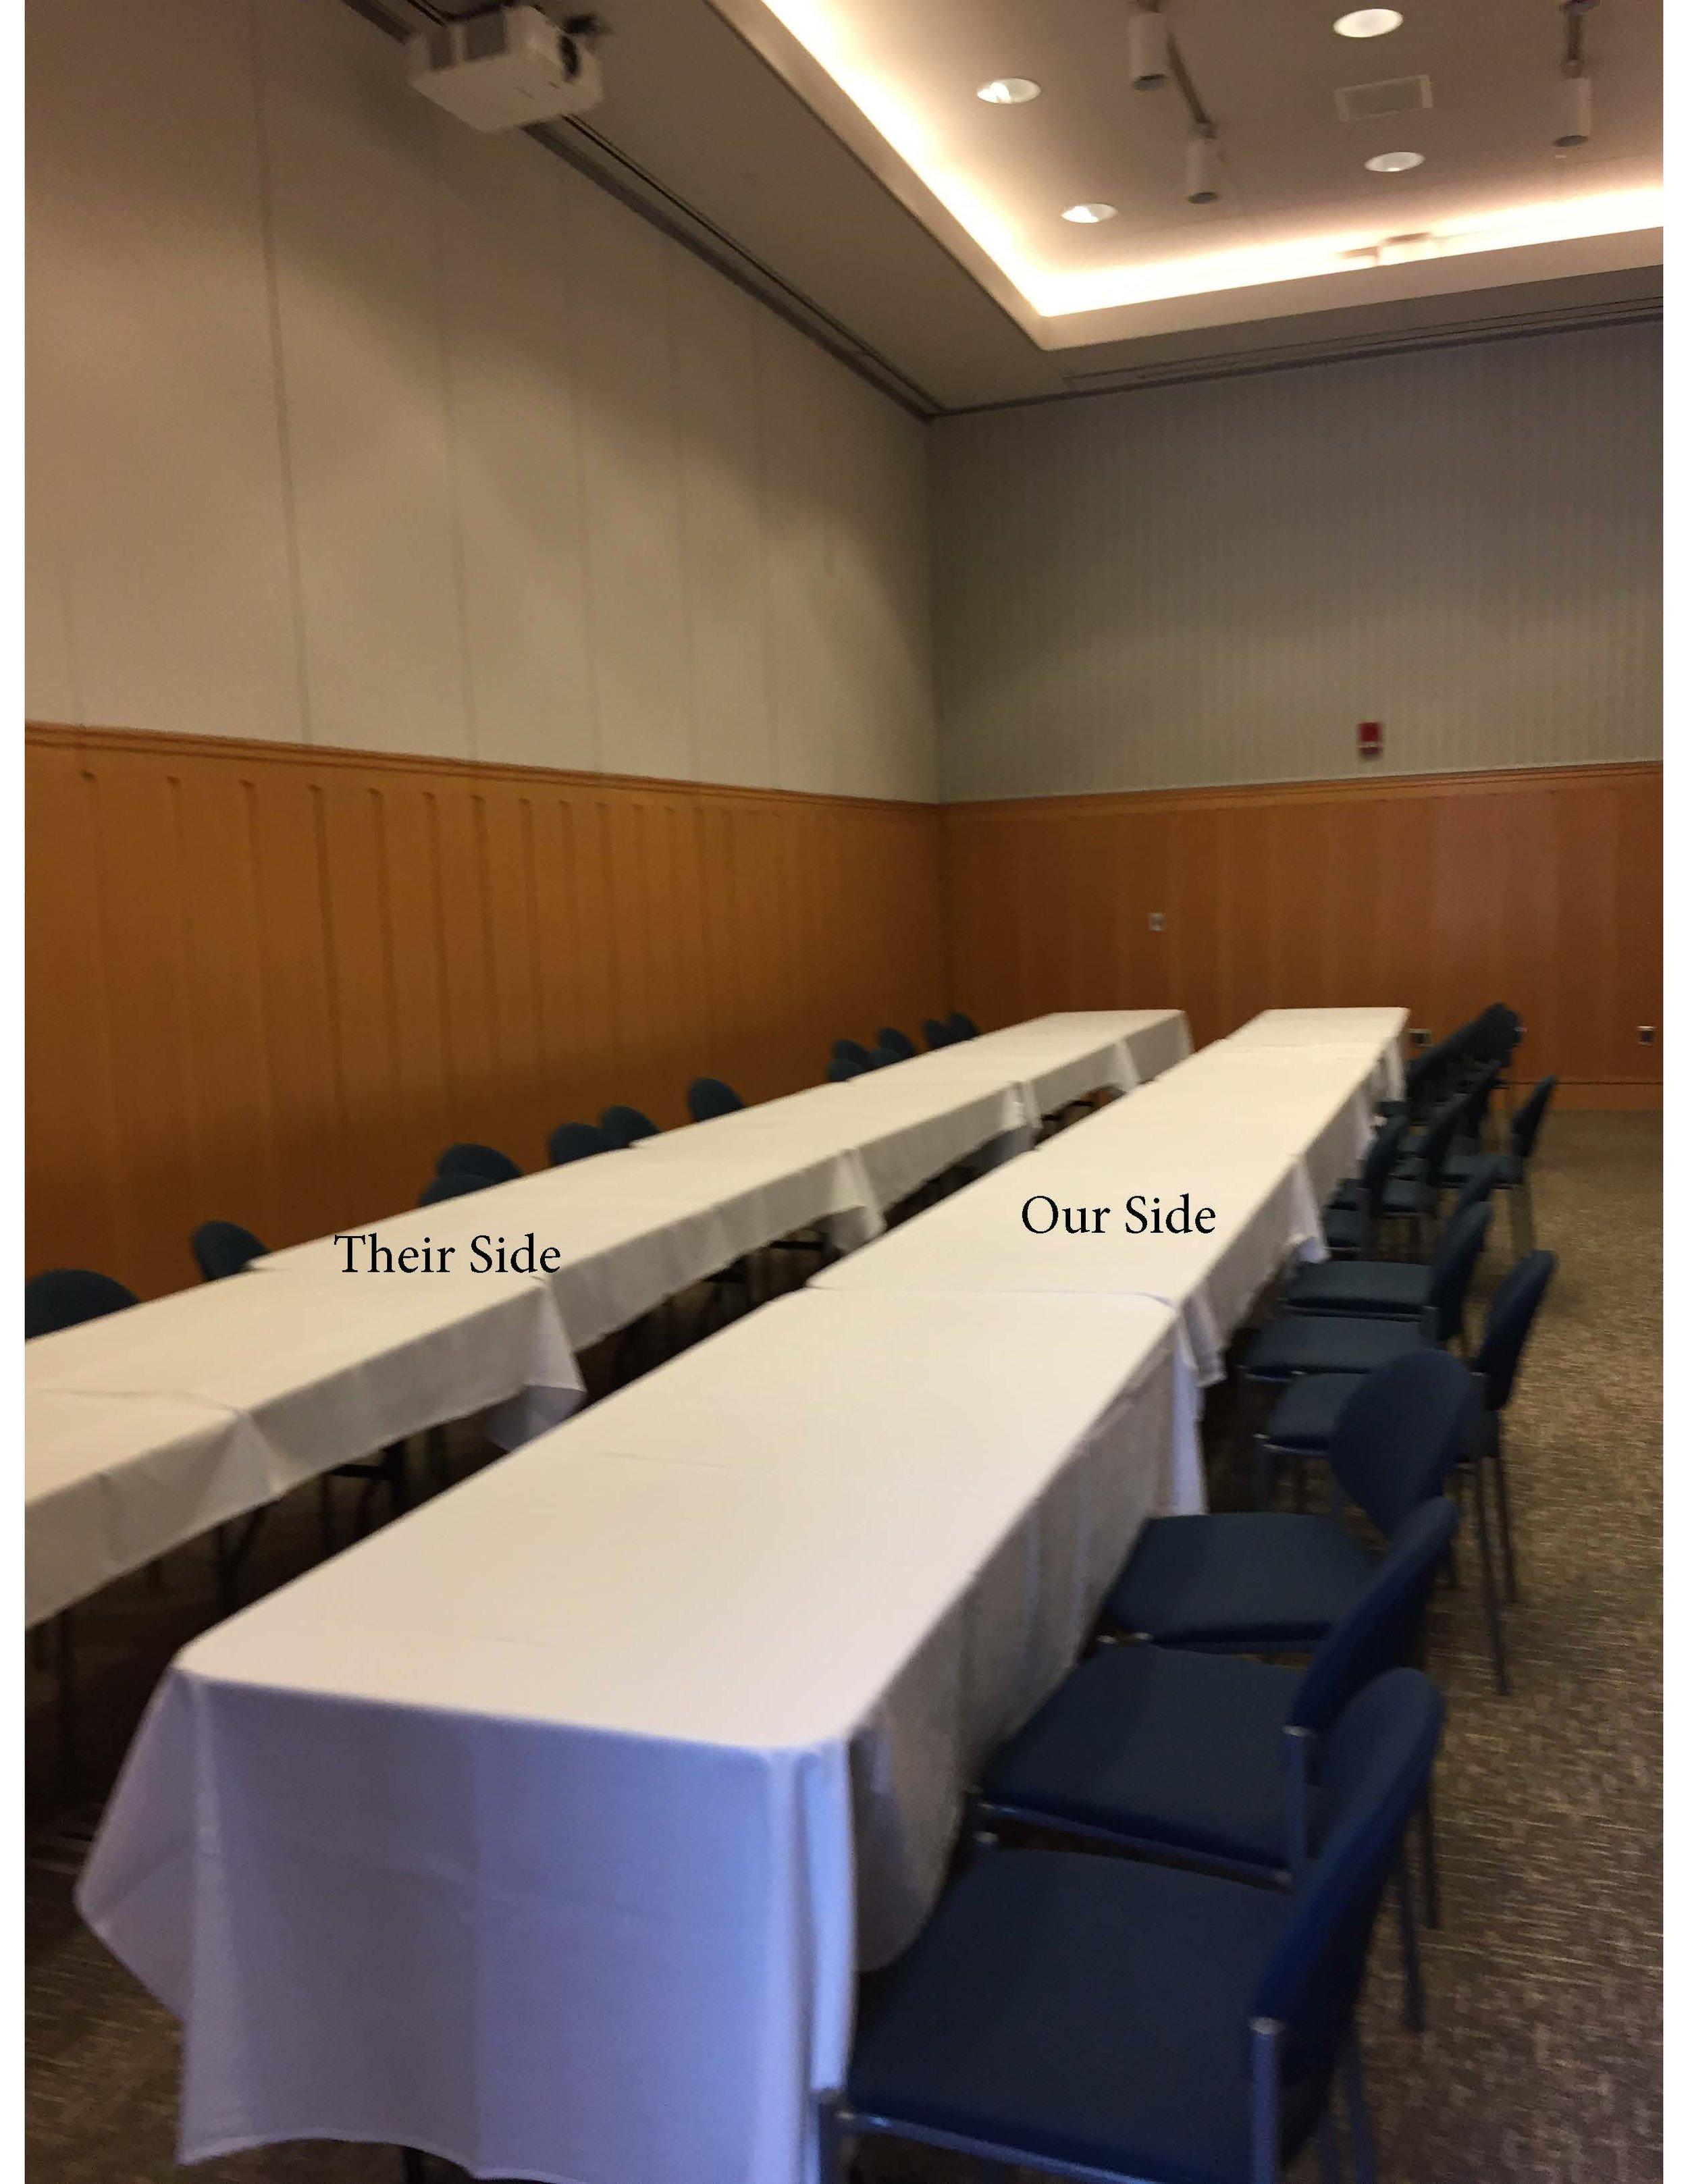 Bargaining Tables Labeled for Blog